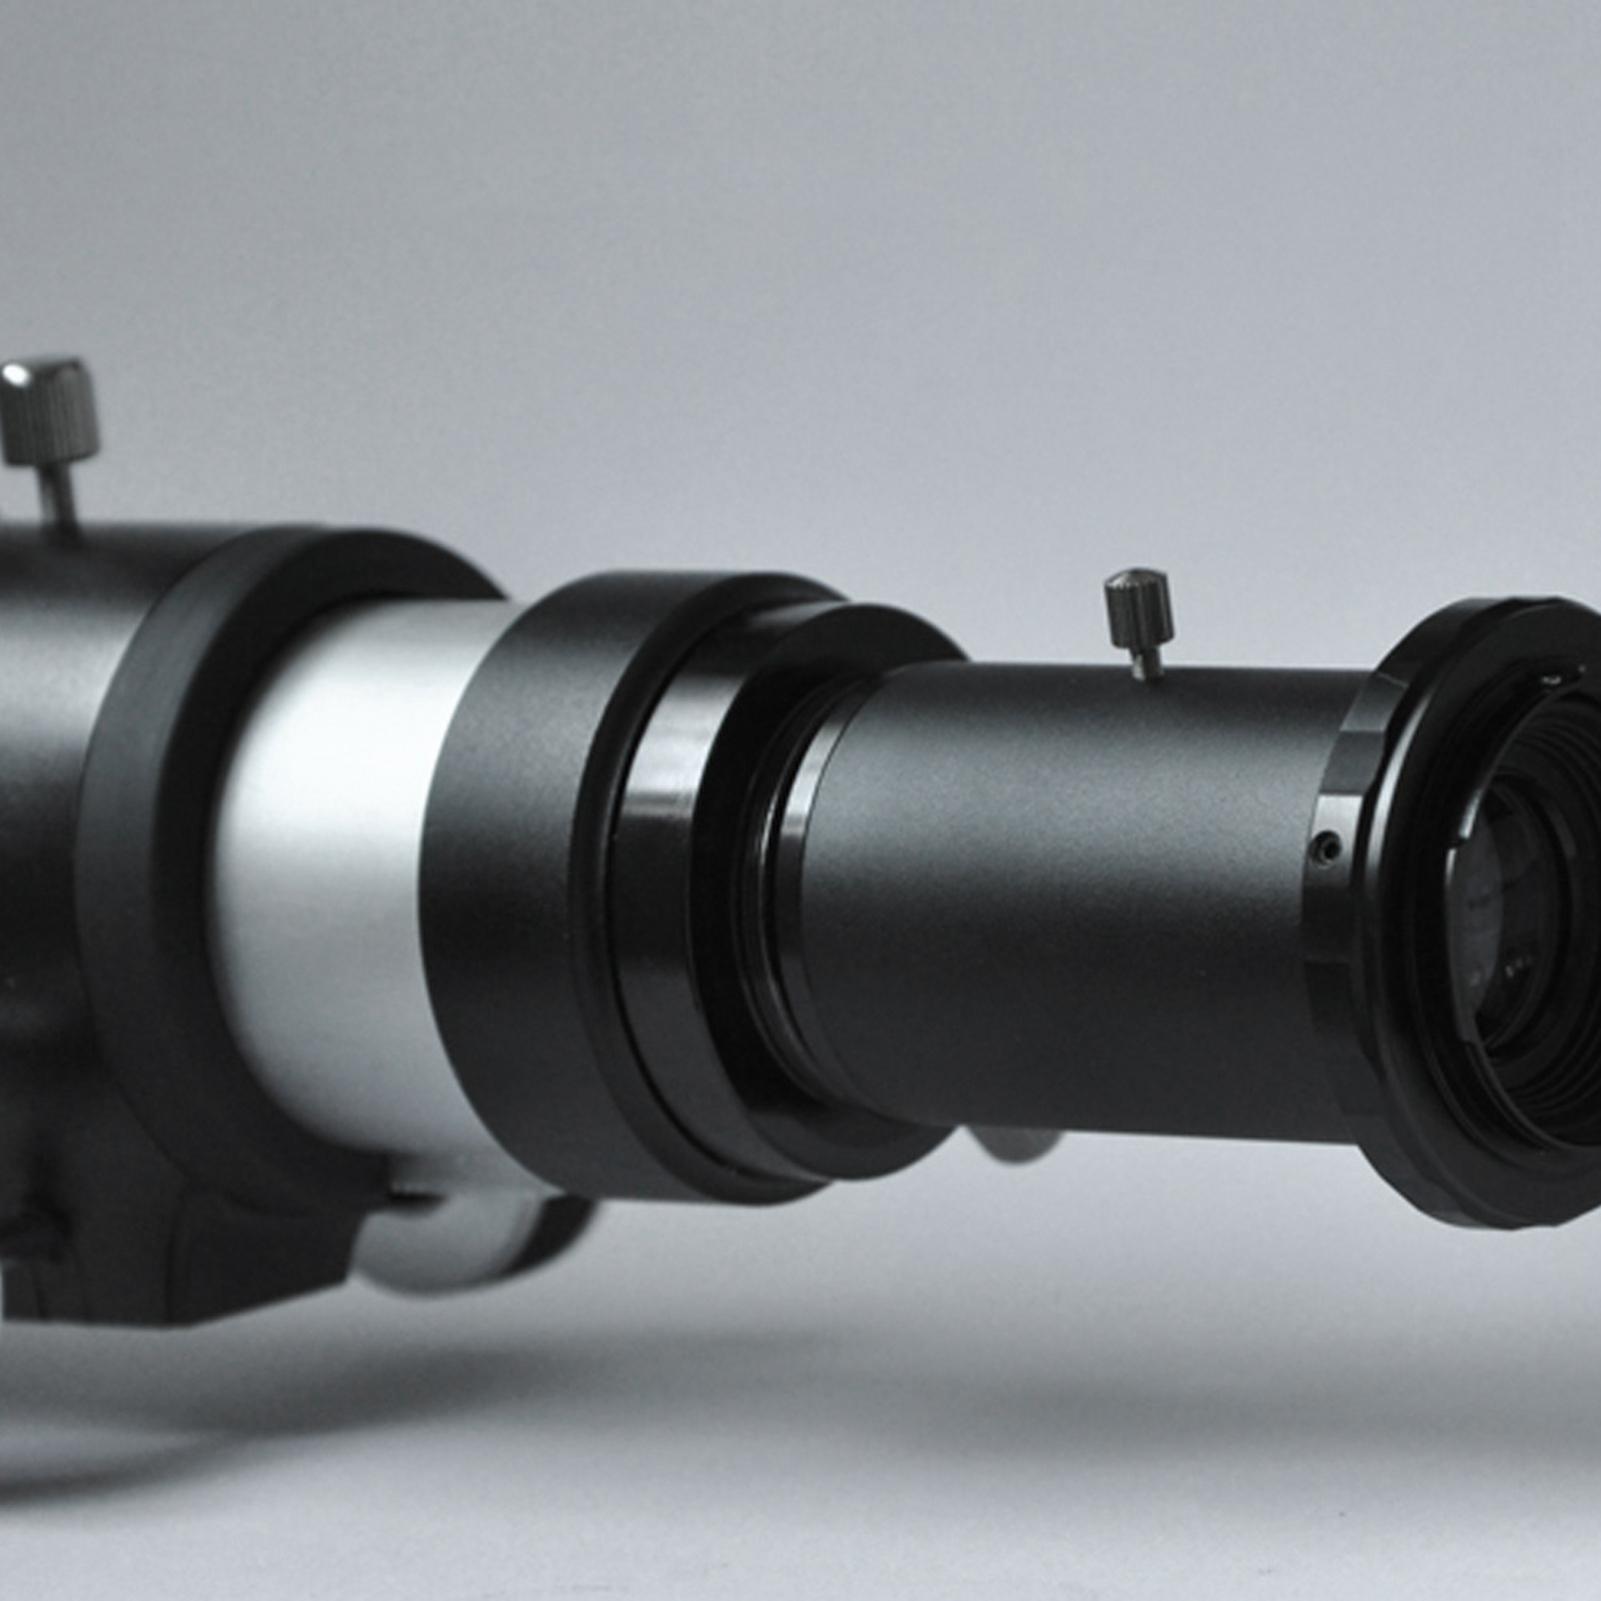 Telescope-Camera-Mount-Adapter-1-25-034-Extension-Tube-T-Ring-for-Canon-EOS-Nikon thumbnail 15